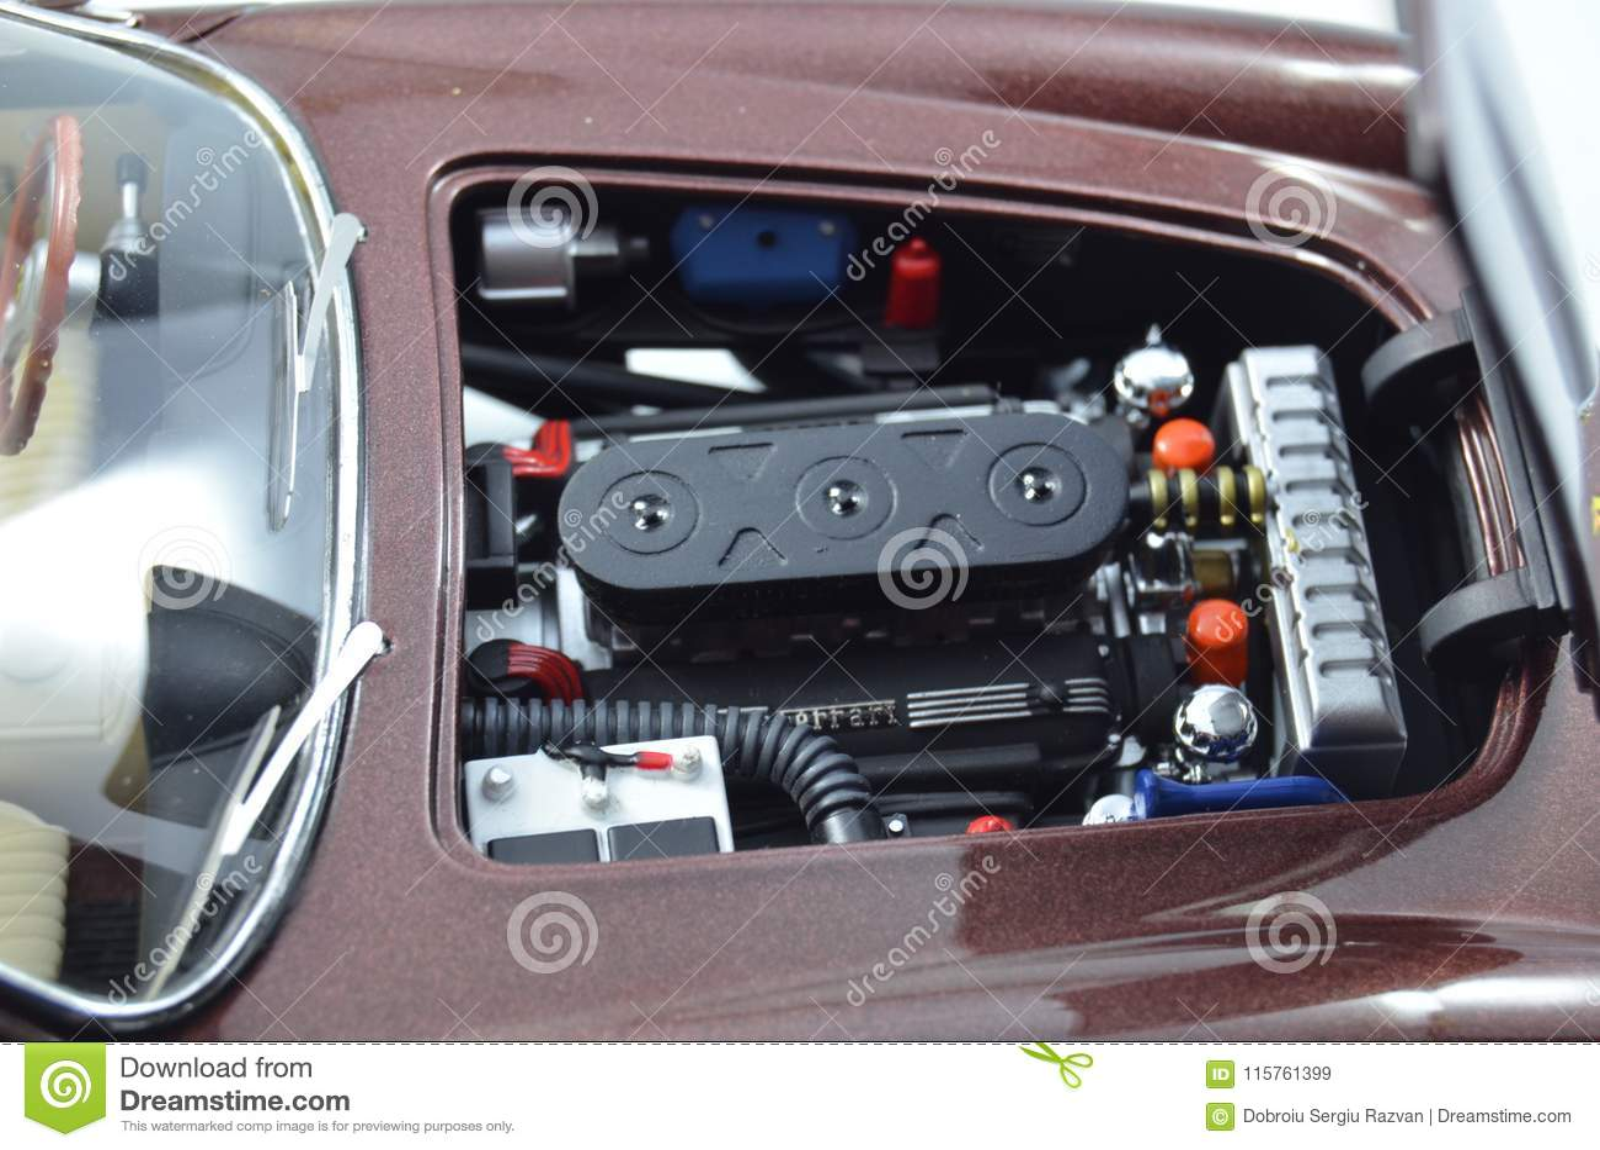 Ferrari 250gt Berlintta Lusso Steve Mcqueen 1 18 Hotwheels Elite Model Car Engine Bay Editorial Stock Image Image Of Collector Berlintta 115761399